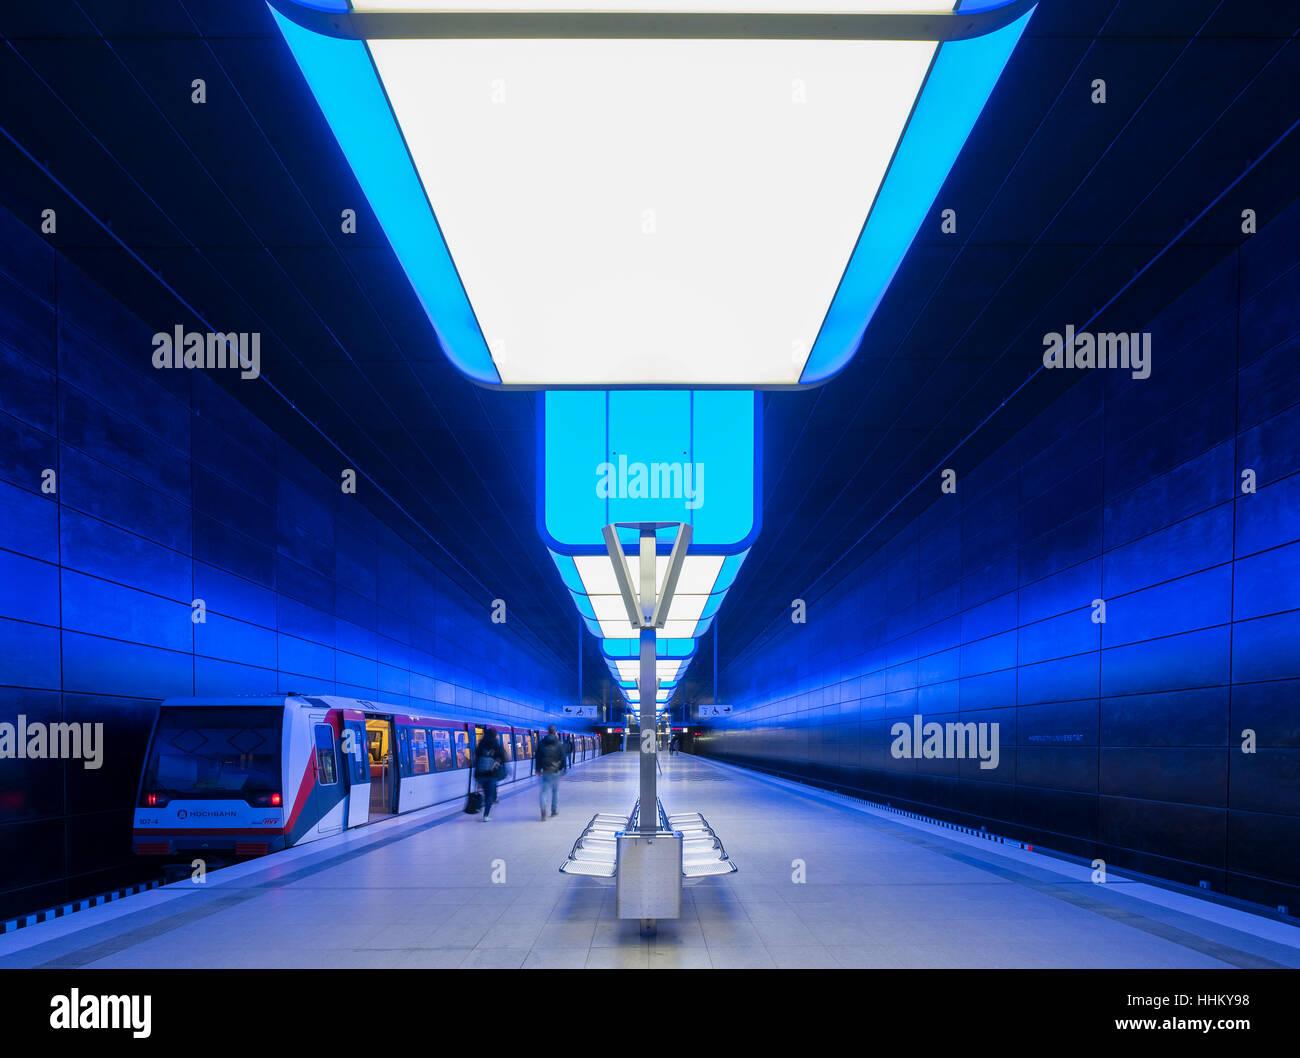 Interior of Hafencity University underground station in Hamburg, Germany - Stock Image